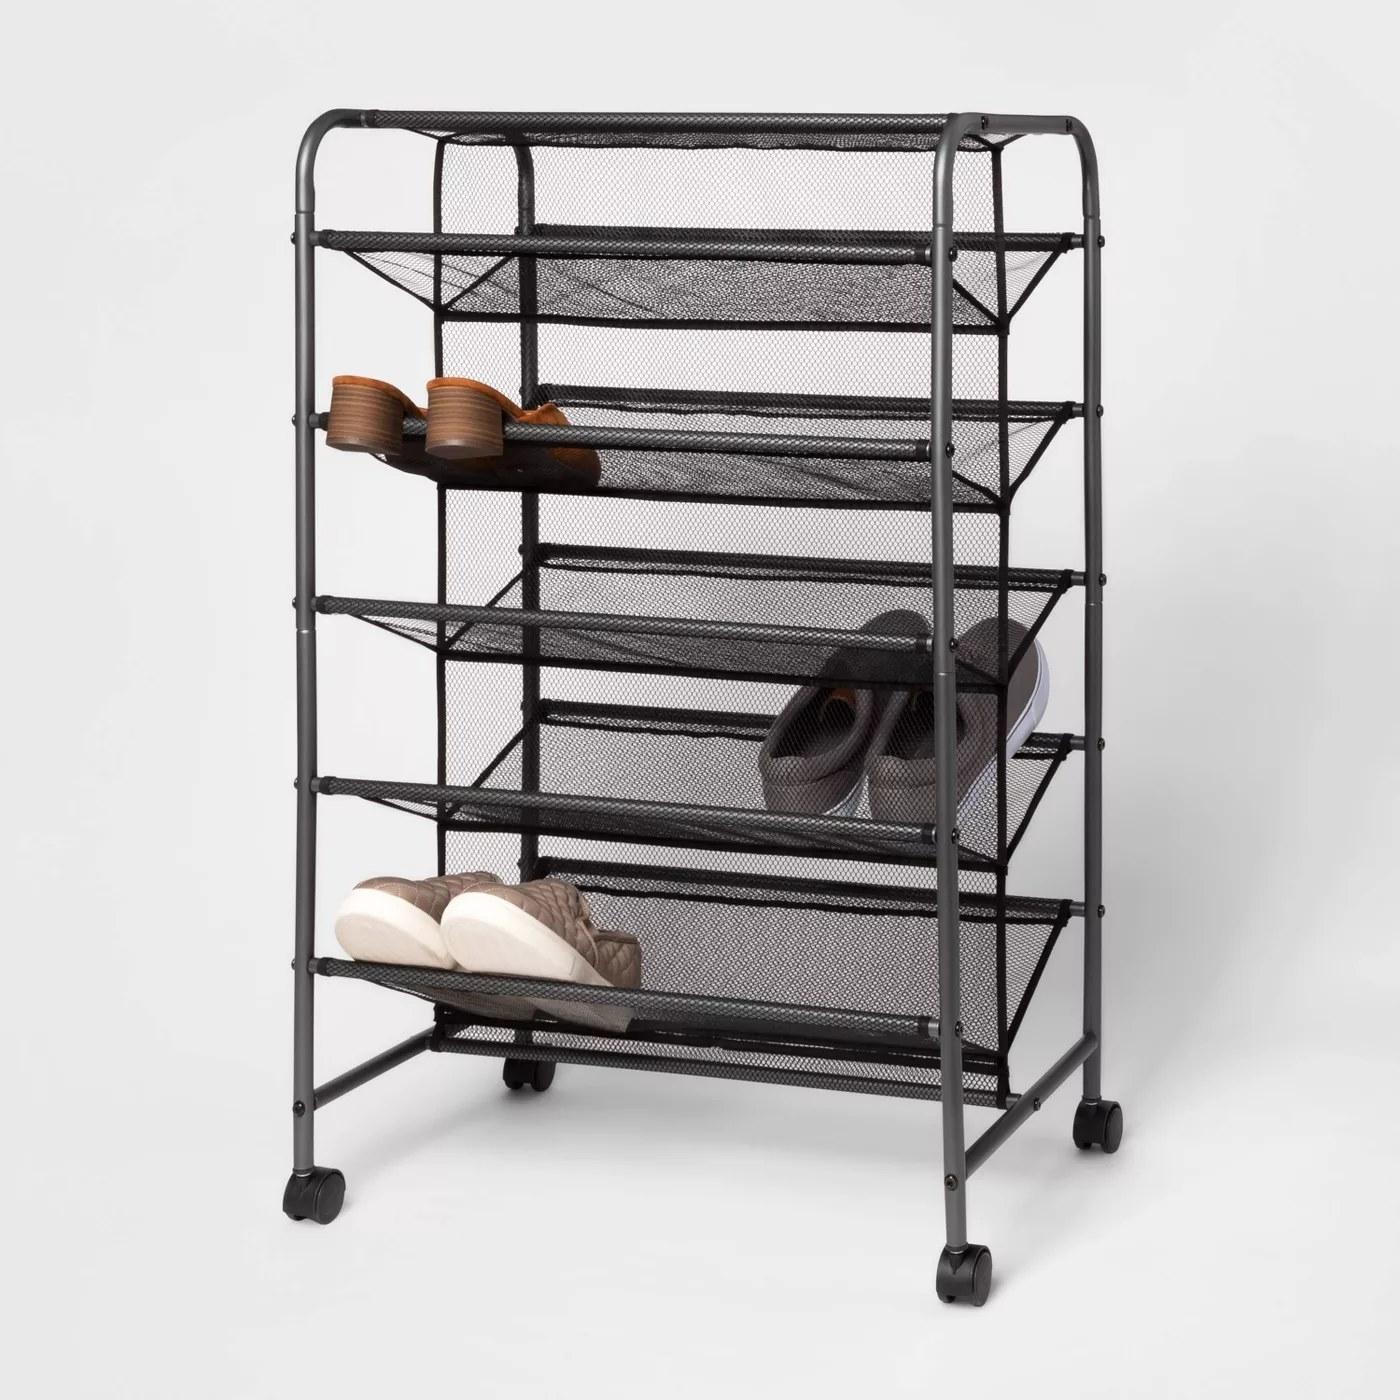 A double-sided shoe rack